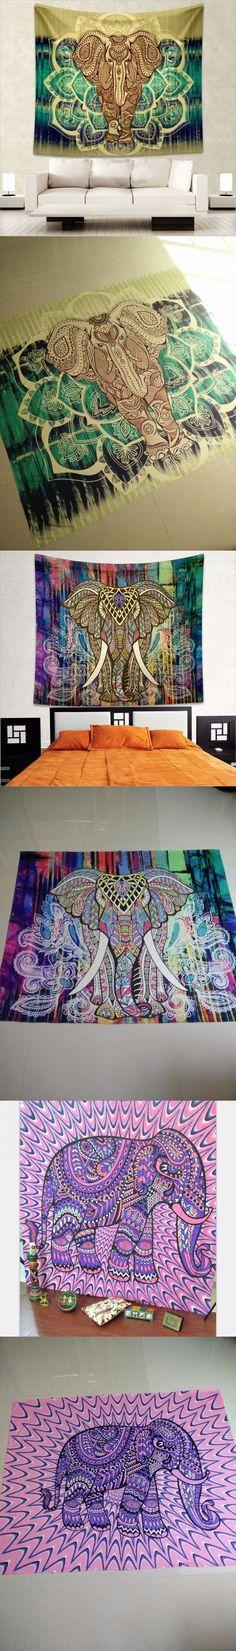 Indian Mandala Tapestry Hippie Home Decorative Wall Hanging Tapestries Boho Beach Towel Yoga Mat Bedspread Table Cloth Indian Mandala, Hippie Home Decor, Mandala Tapestry, Tapestry Wall Hanging, Tapestries, Bed Spreads, Beach Towel, Boho, Master Bedroom